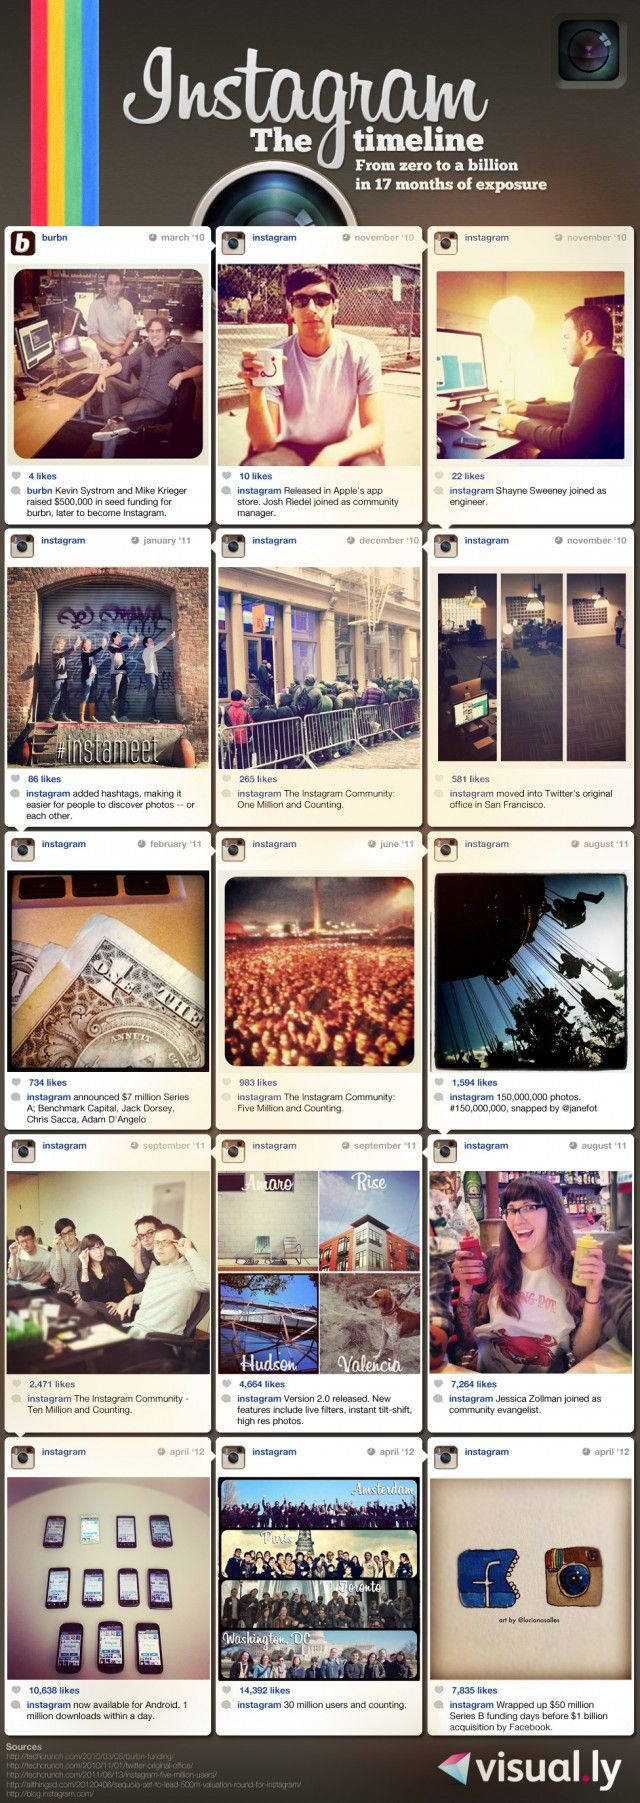 The rise of Instagram, in pictures: Instagram Timeline, Social Media, Billion, Zero, Socialmedia, Infographics, 17 Months